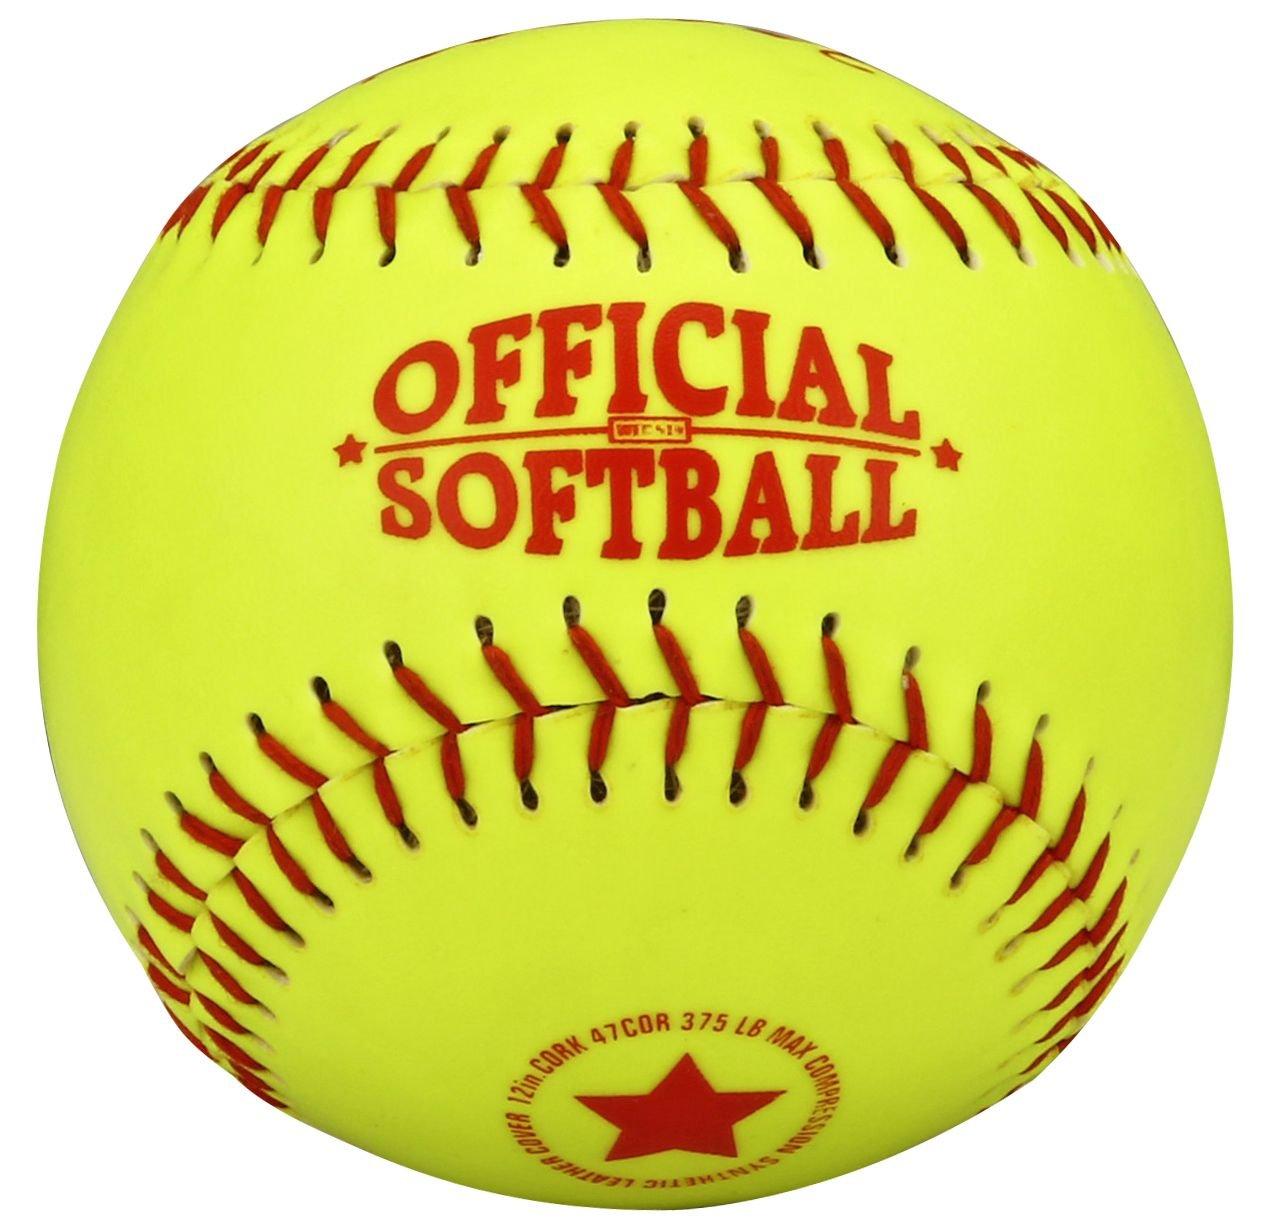 SCHREUDERS SPORT Unisex 23MH Baseball, Fluoreszierend, Einheitsgröße, Gelb Einheitsgröße Schreuders Sports Schreuders Sport_23MH-FLG-Uni